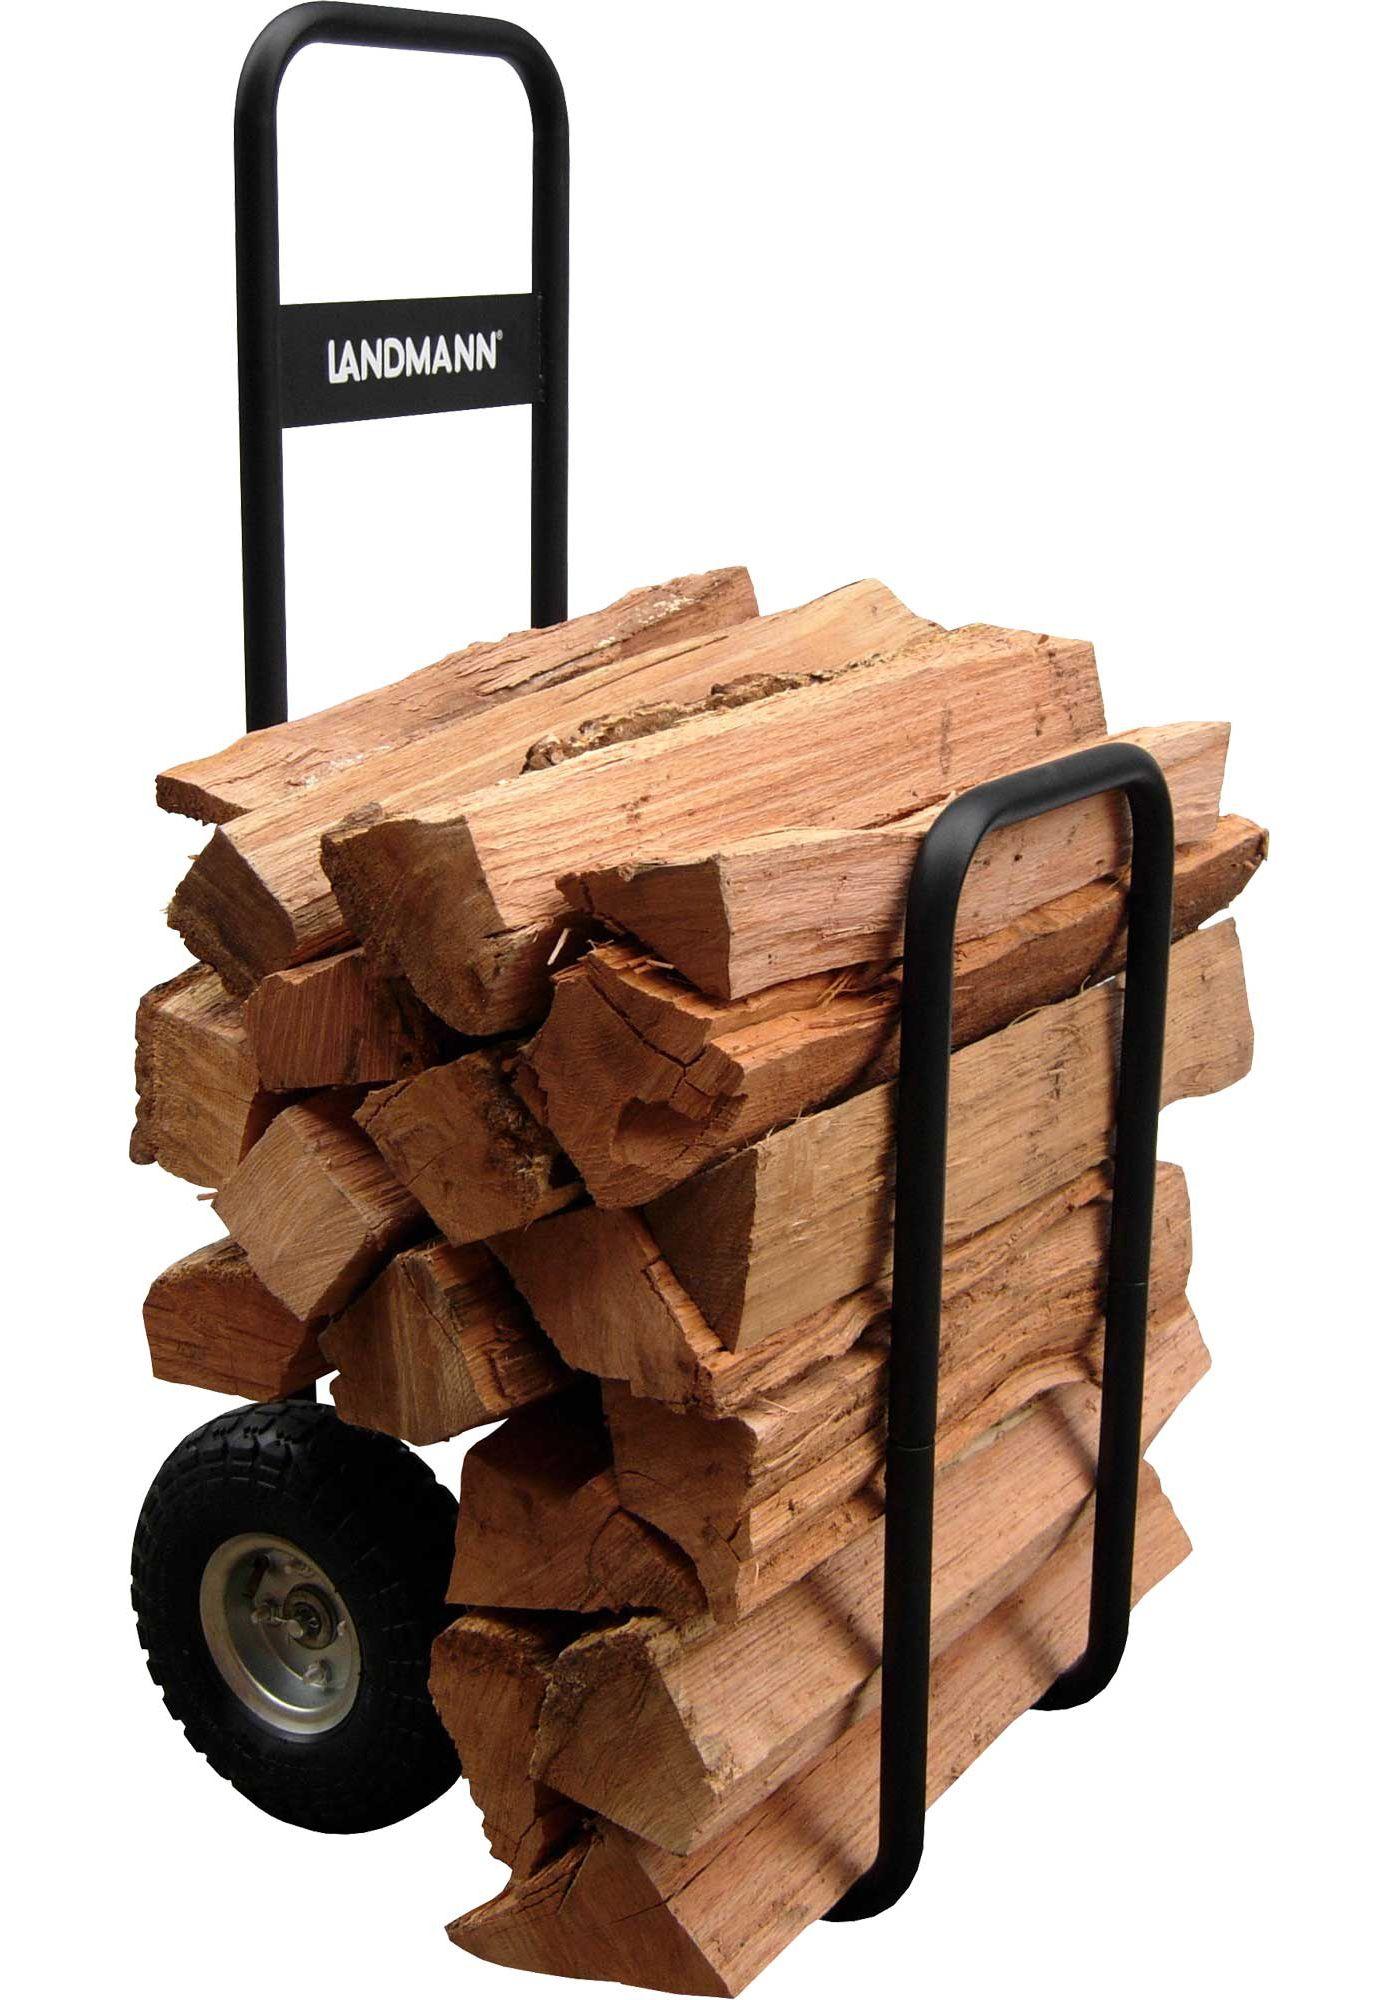 Landmann Log Caddy with Cover